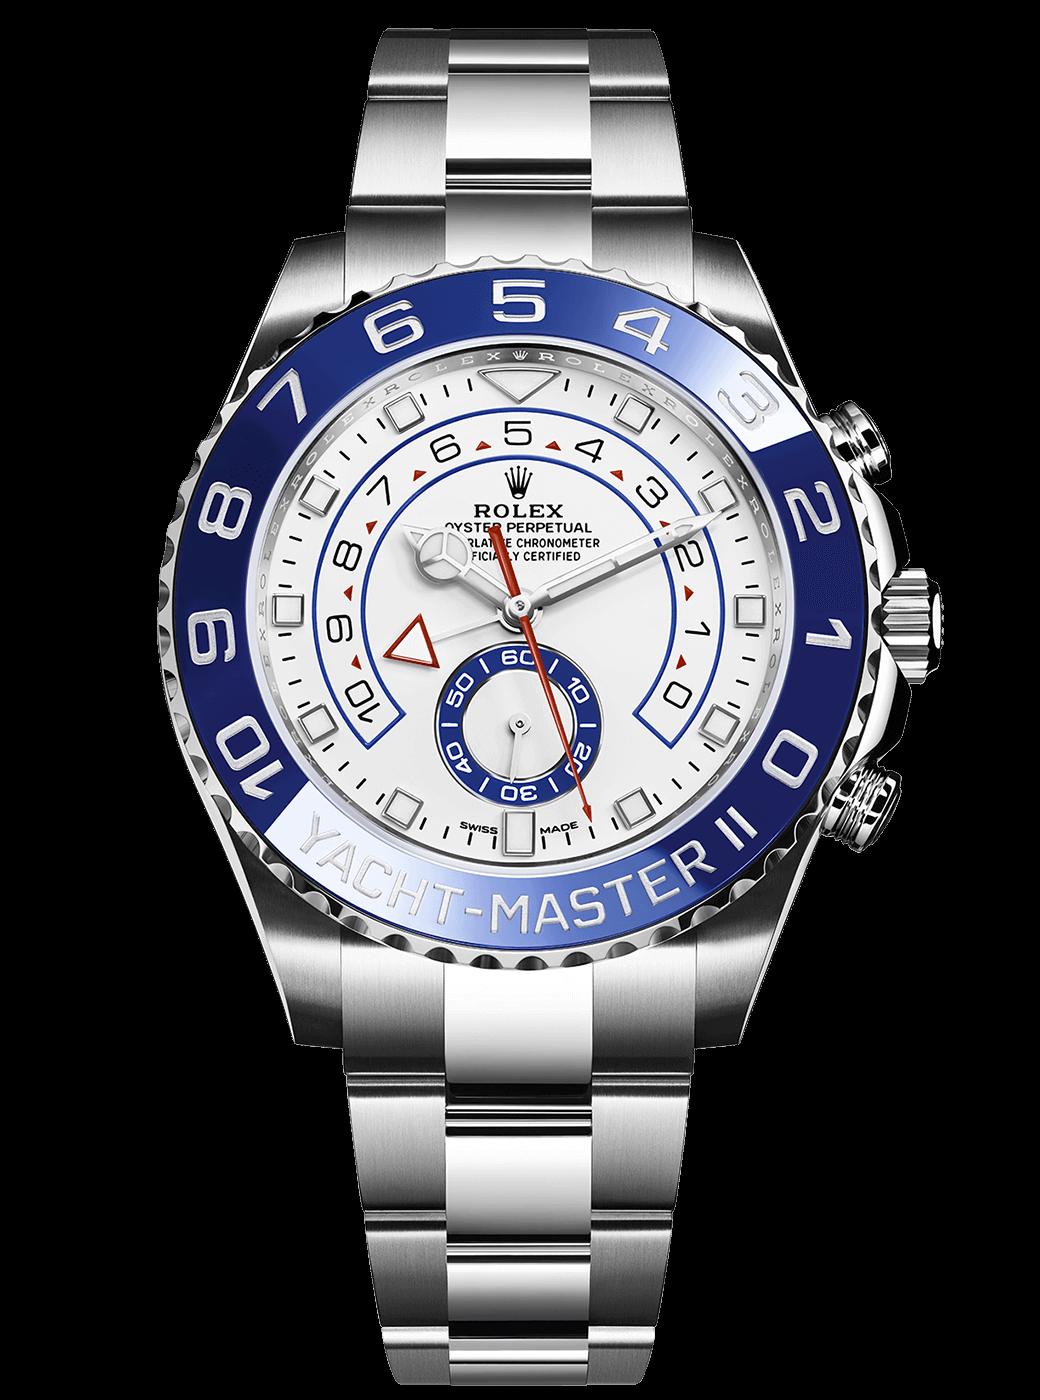 Rolex 2017 Yacht-Master ll 116680 Swiss Automatic Watch